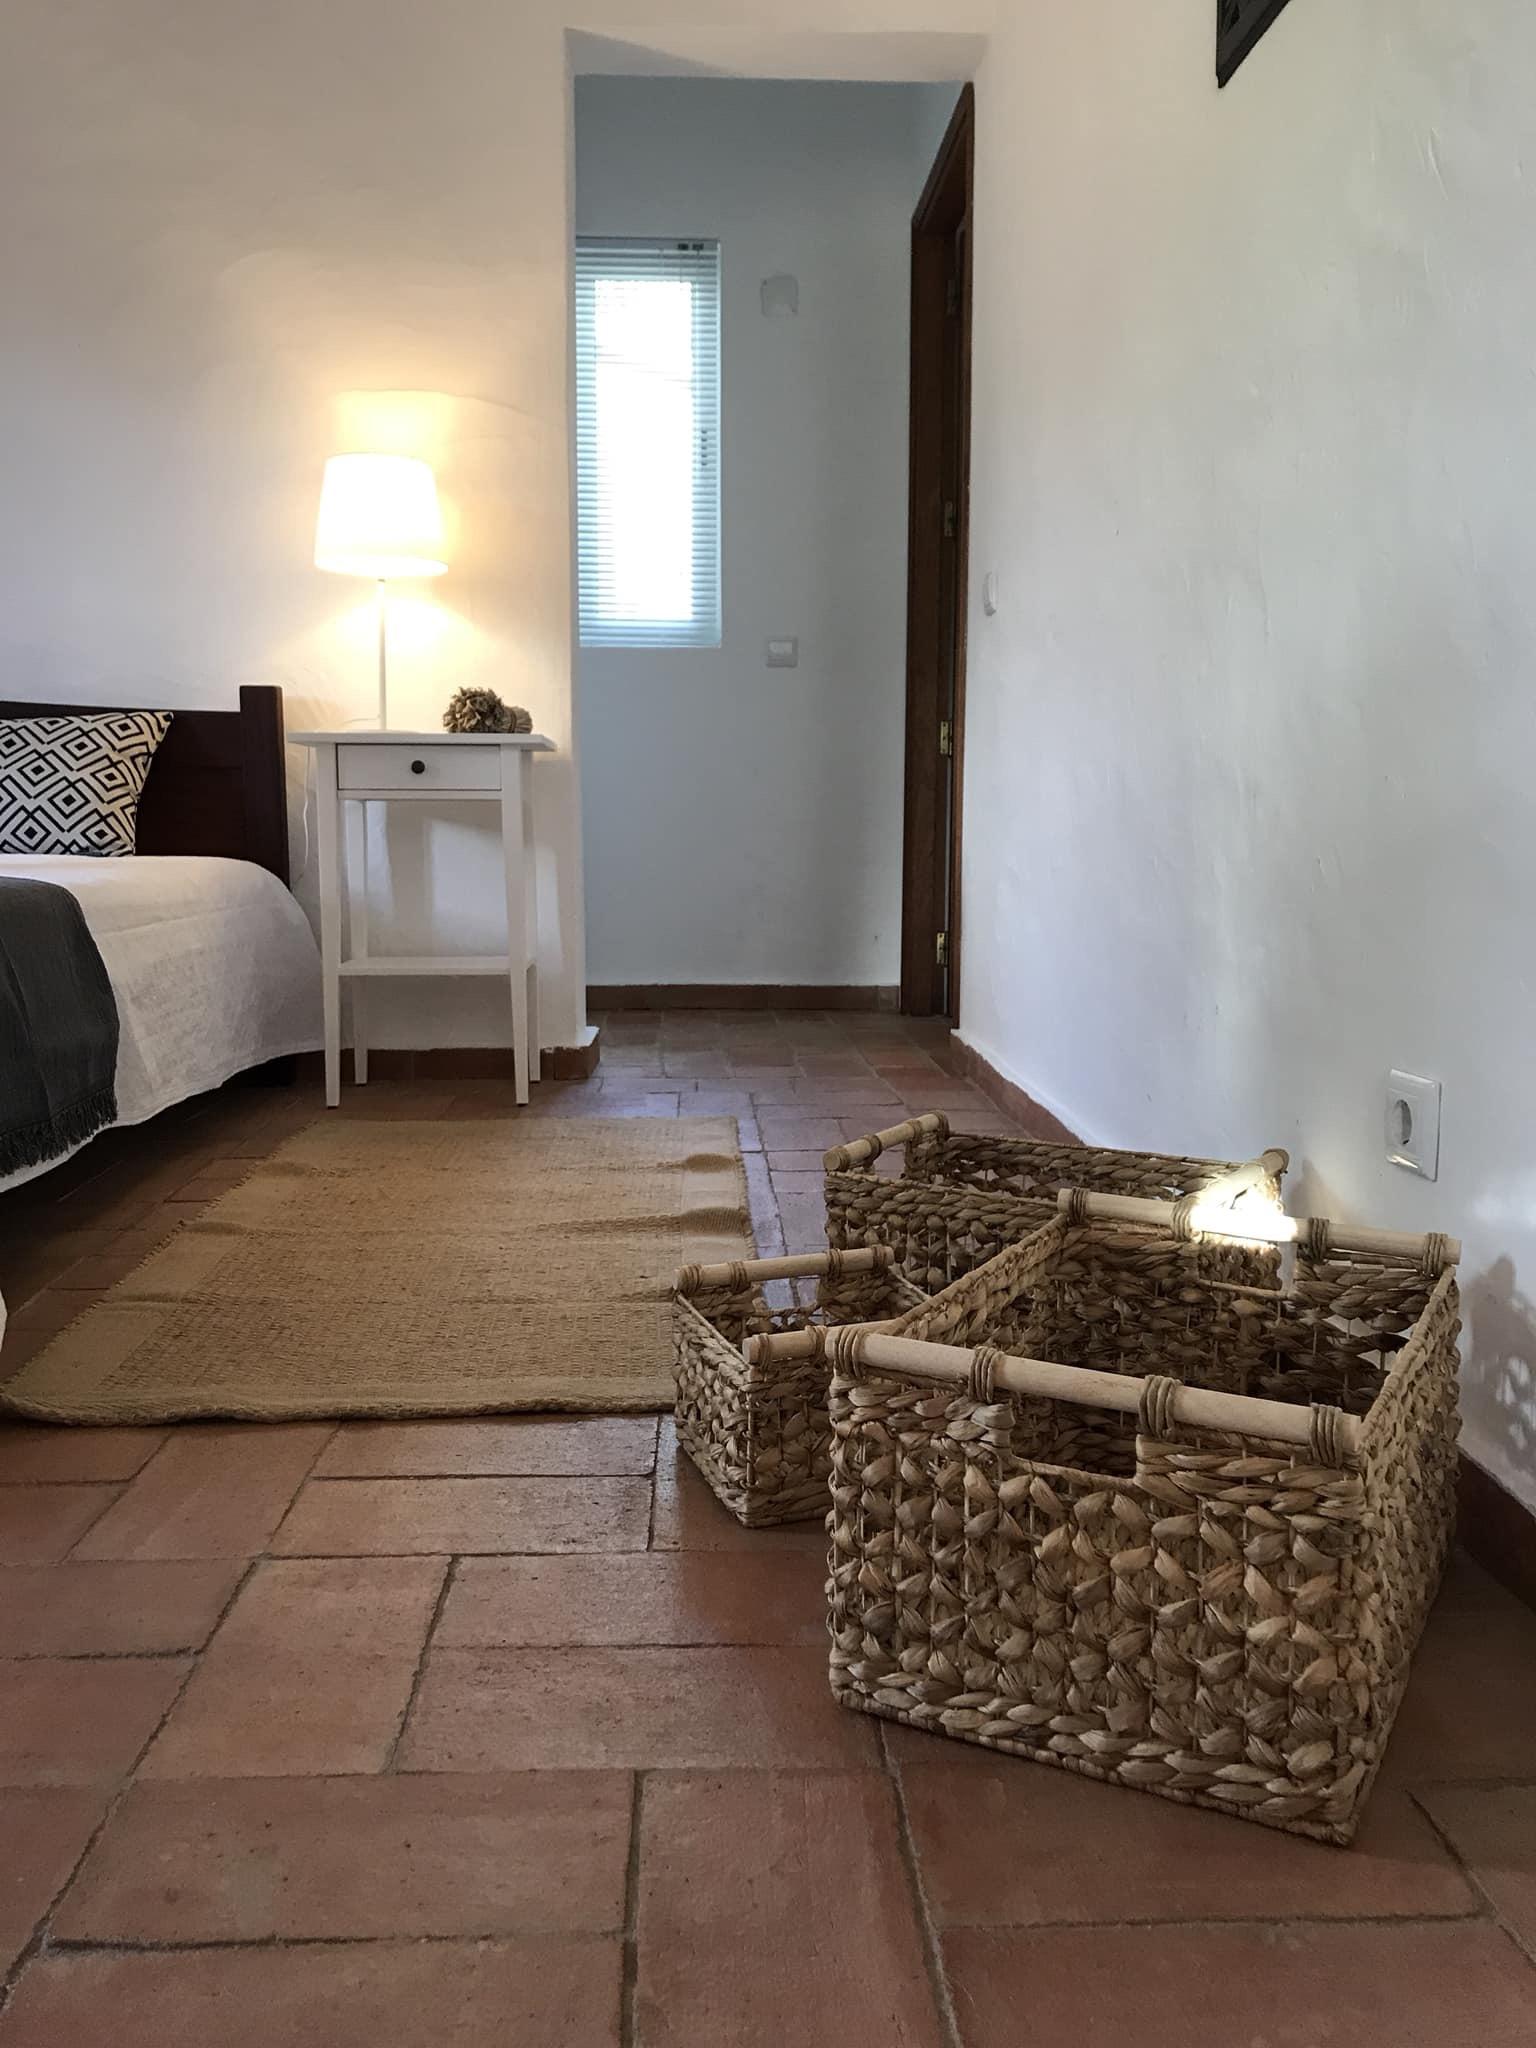 Holiday apartments and villas for rent, Quinta Valérina Casa Amendoiera in Quelfes Olhao, Portugal Algarve, REF_IMG_14285_14291